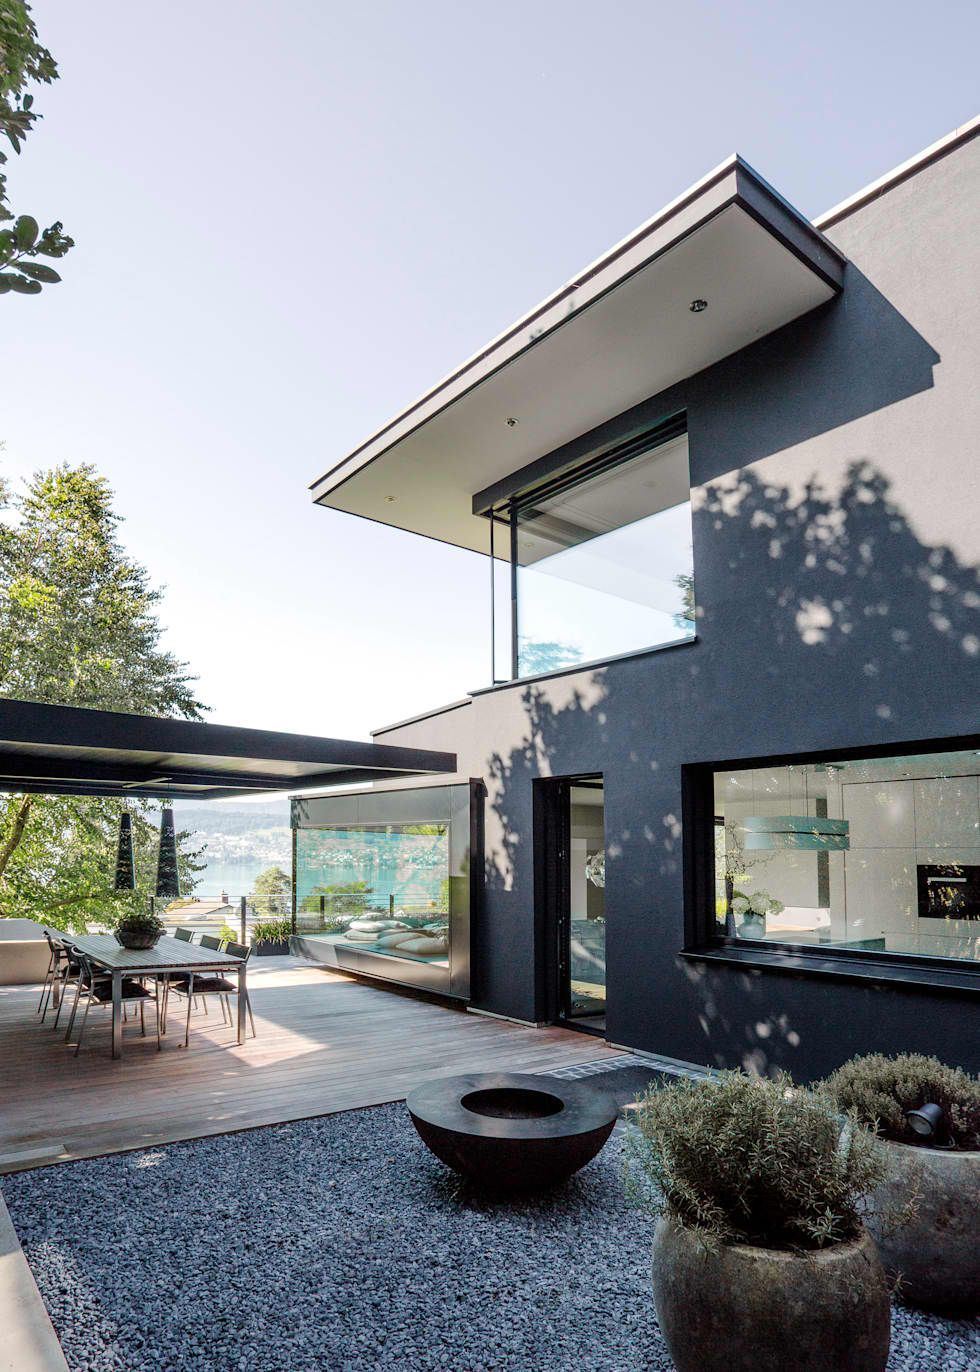 868 336 Exterior Home Design Ideas Remodel Pictures